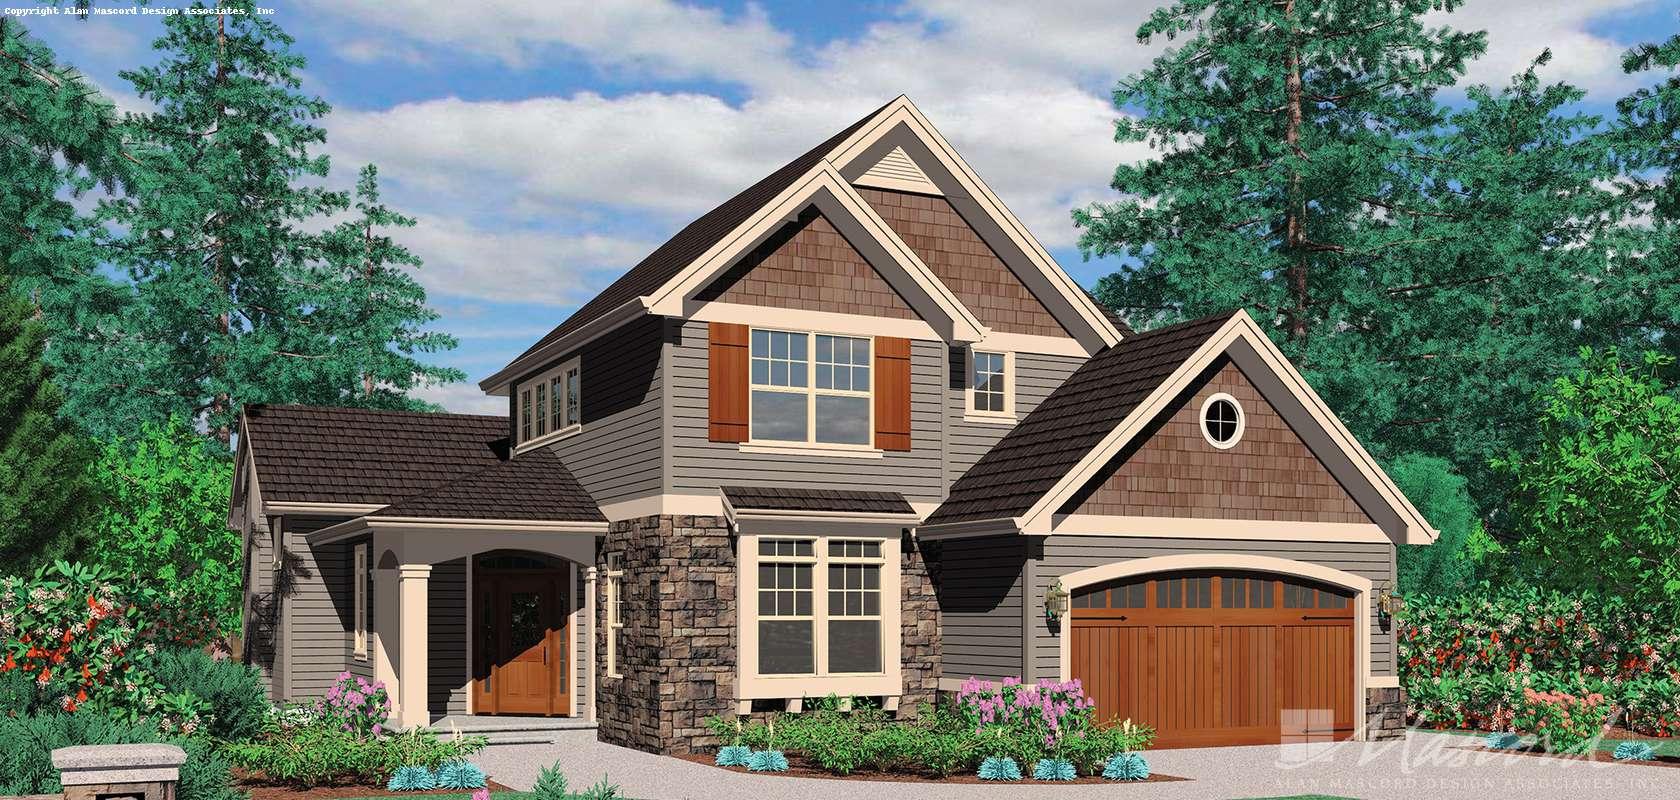 Mascord House Plan B22138A: The Kenesaw